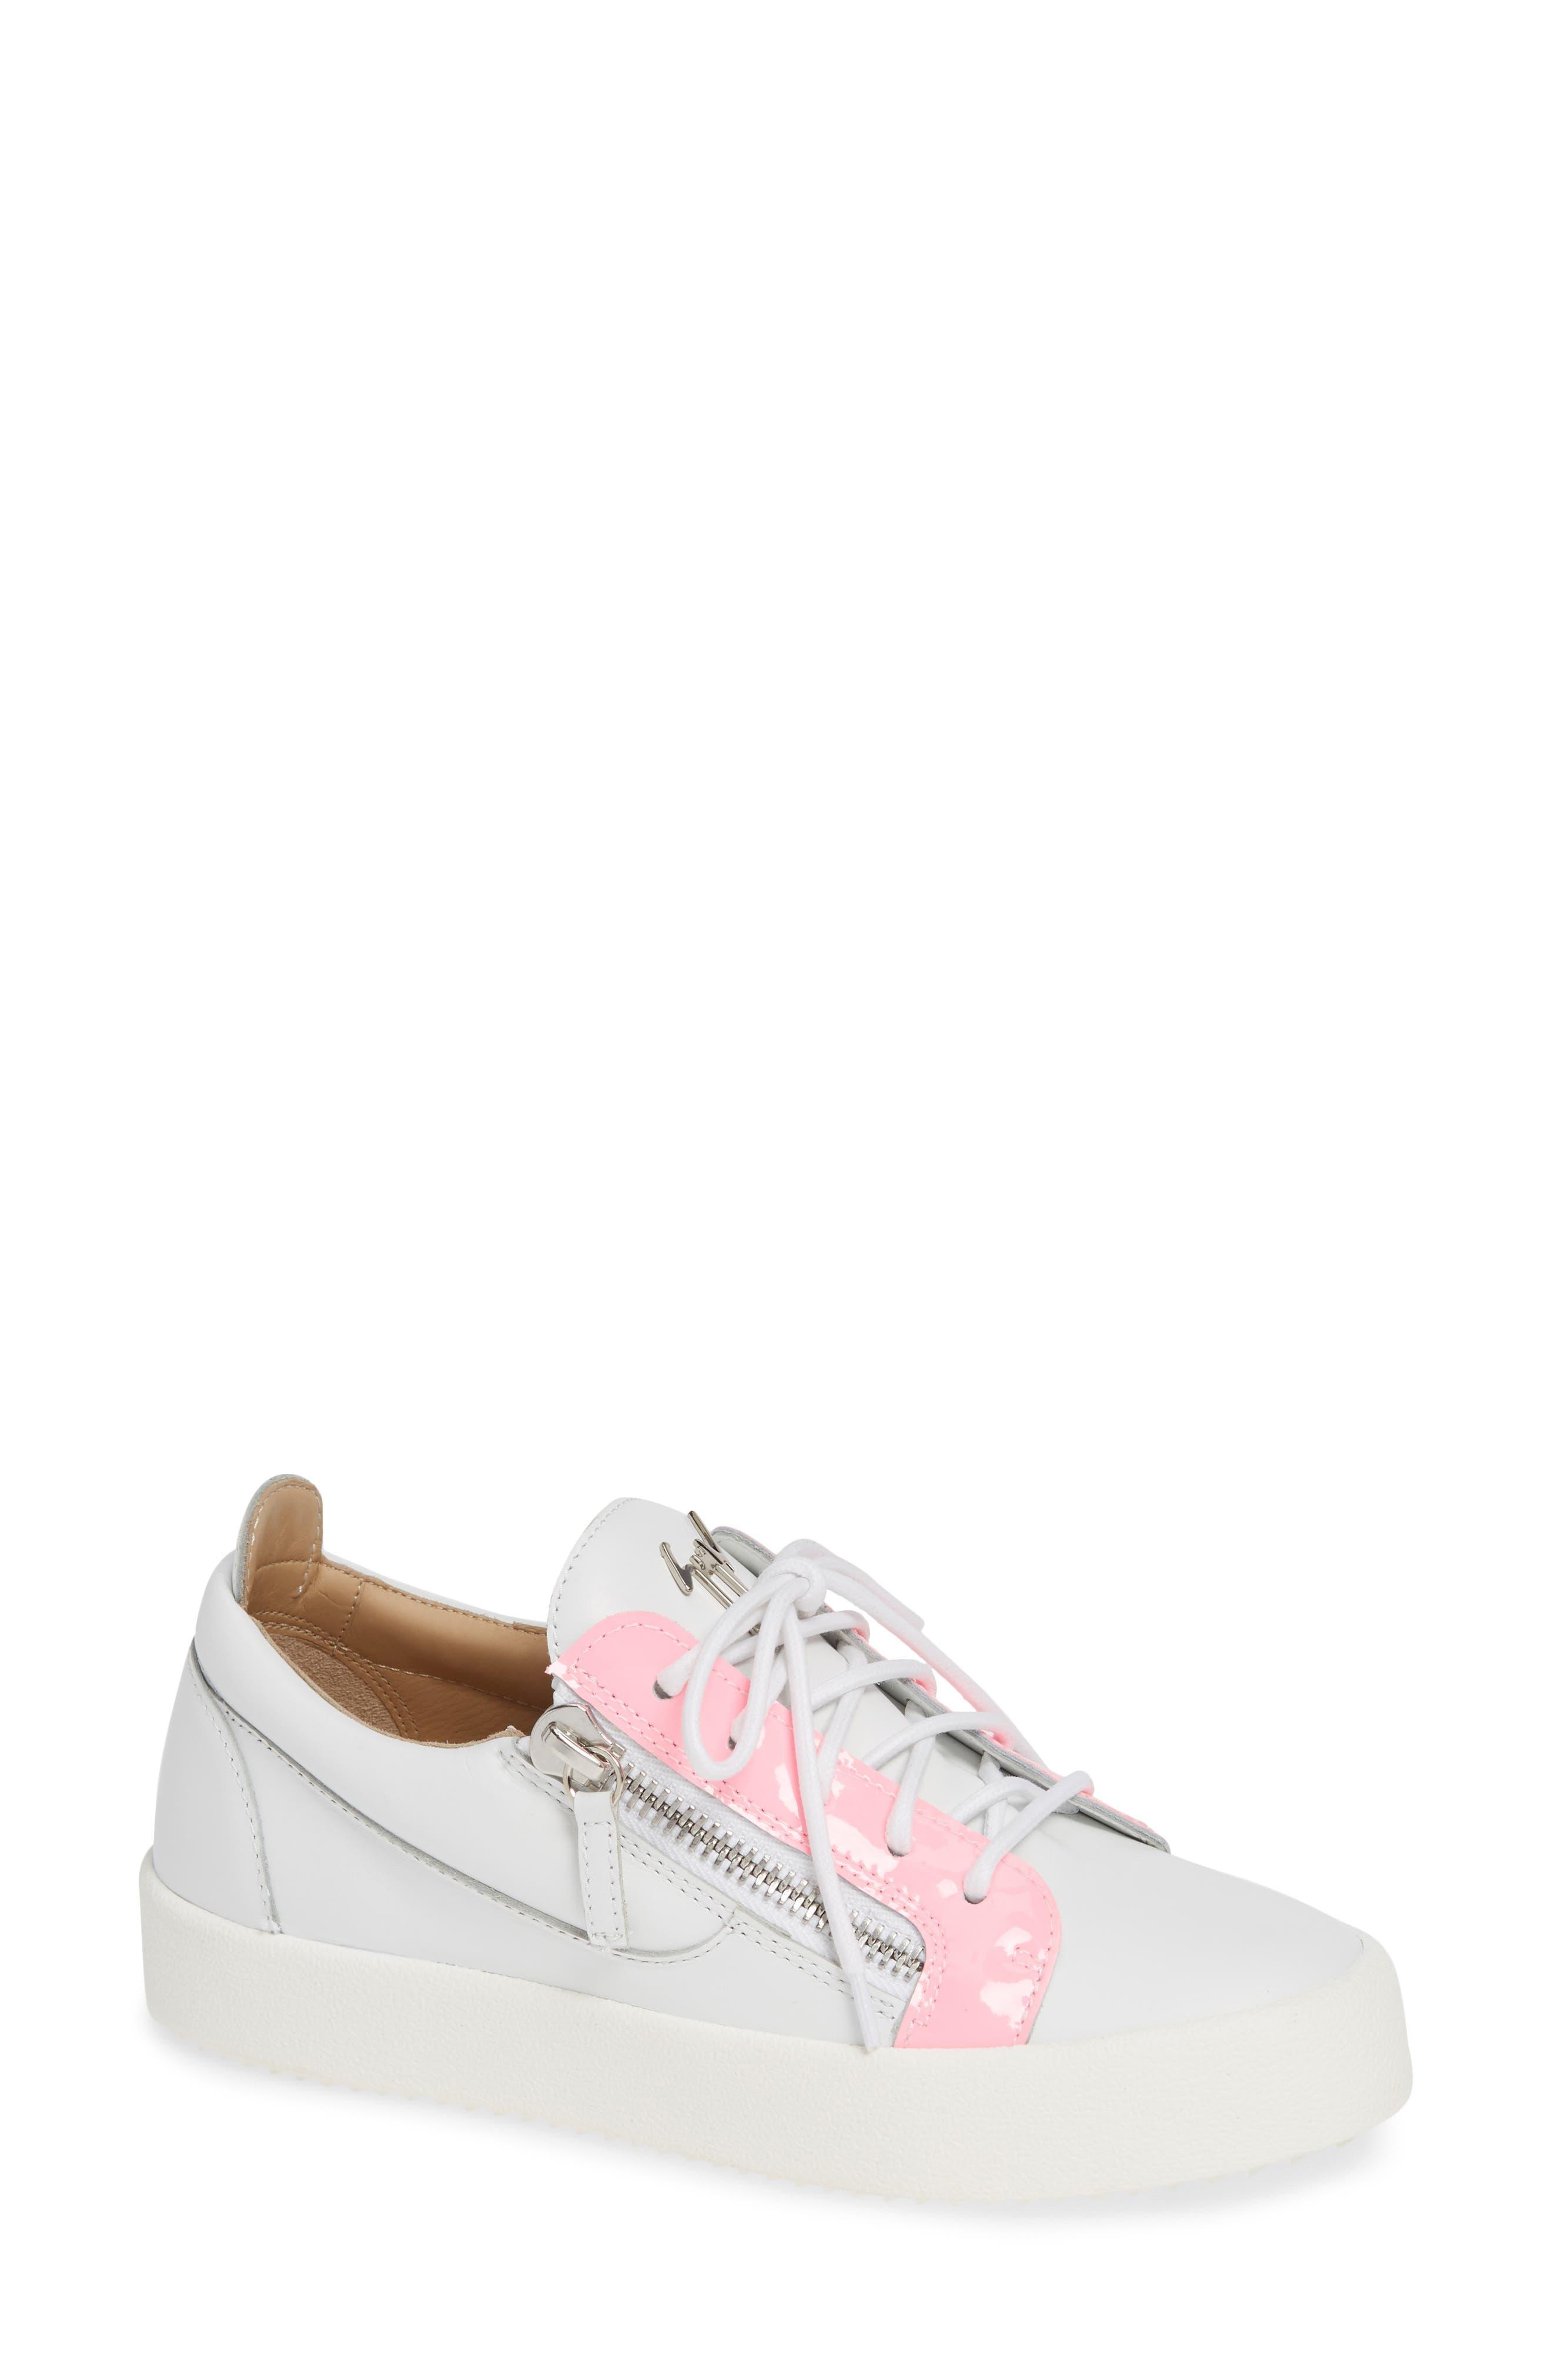 Low Top Sneaker, Main, color, WHITE/ FUCHSIA